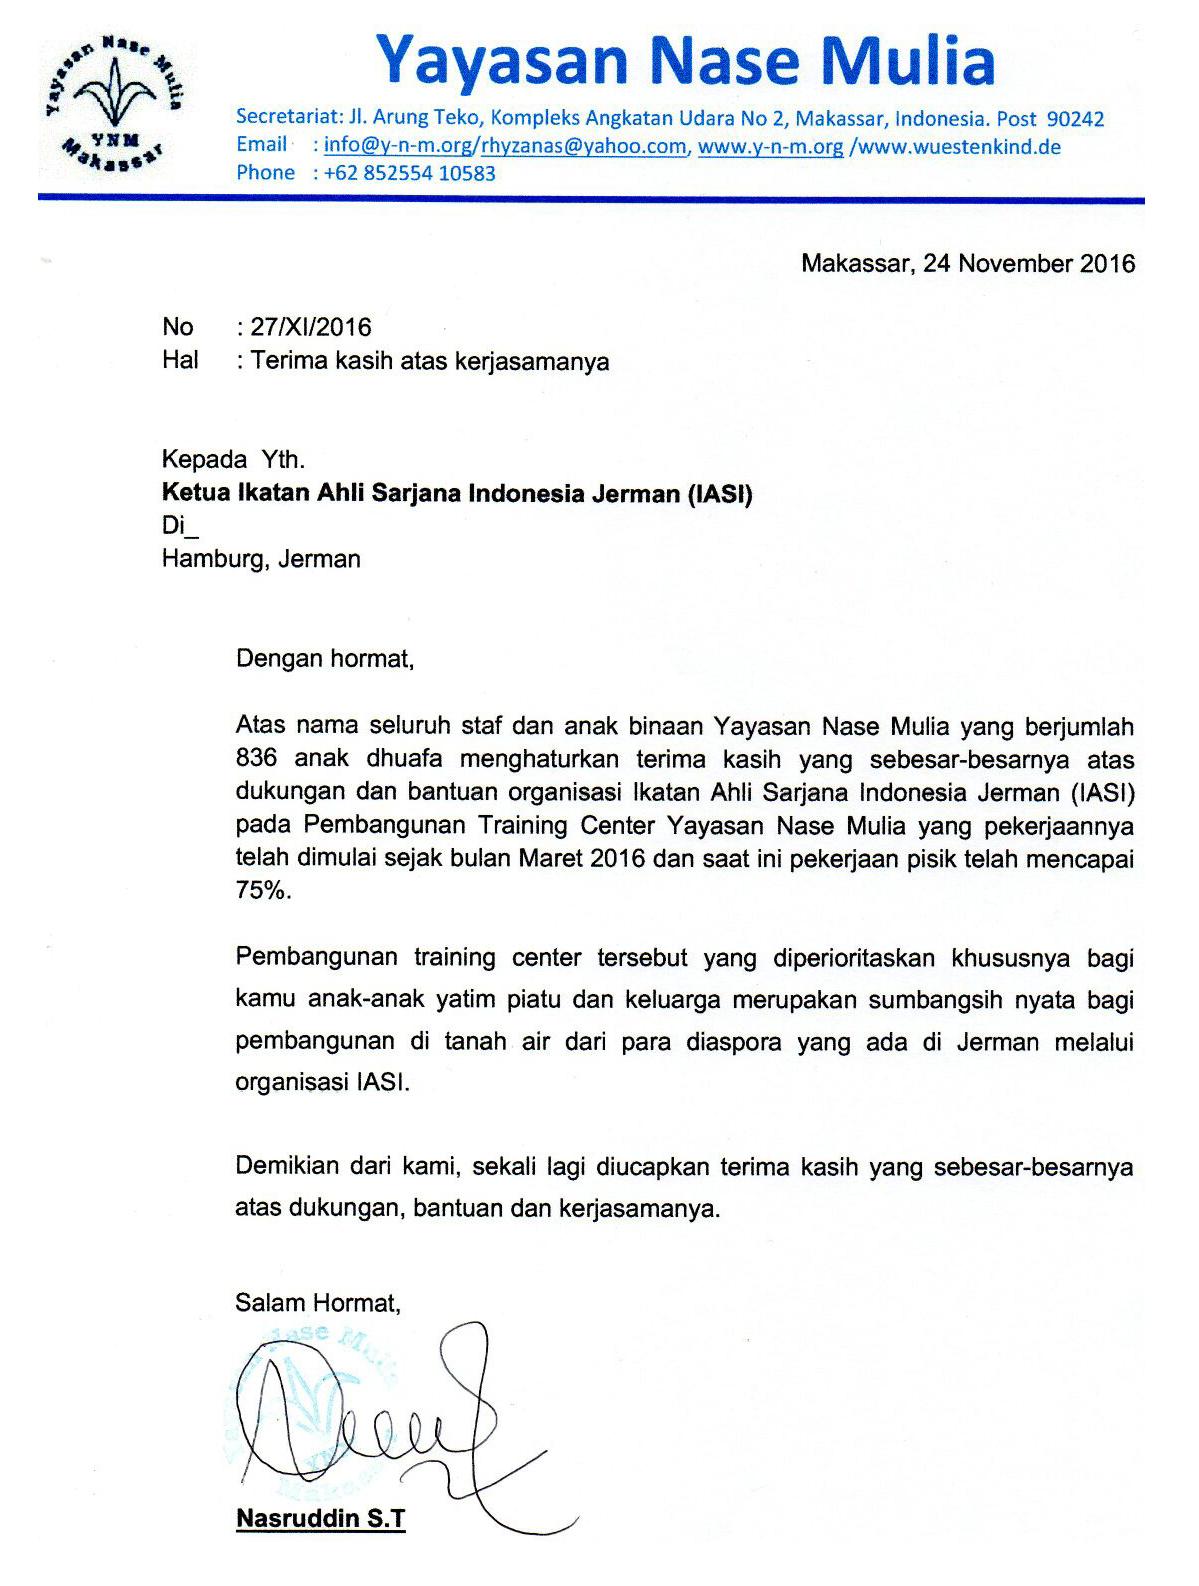 Yayasan Nase Mulia-IASI